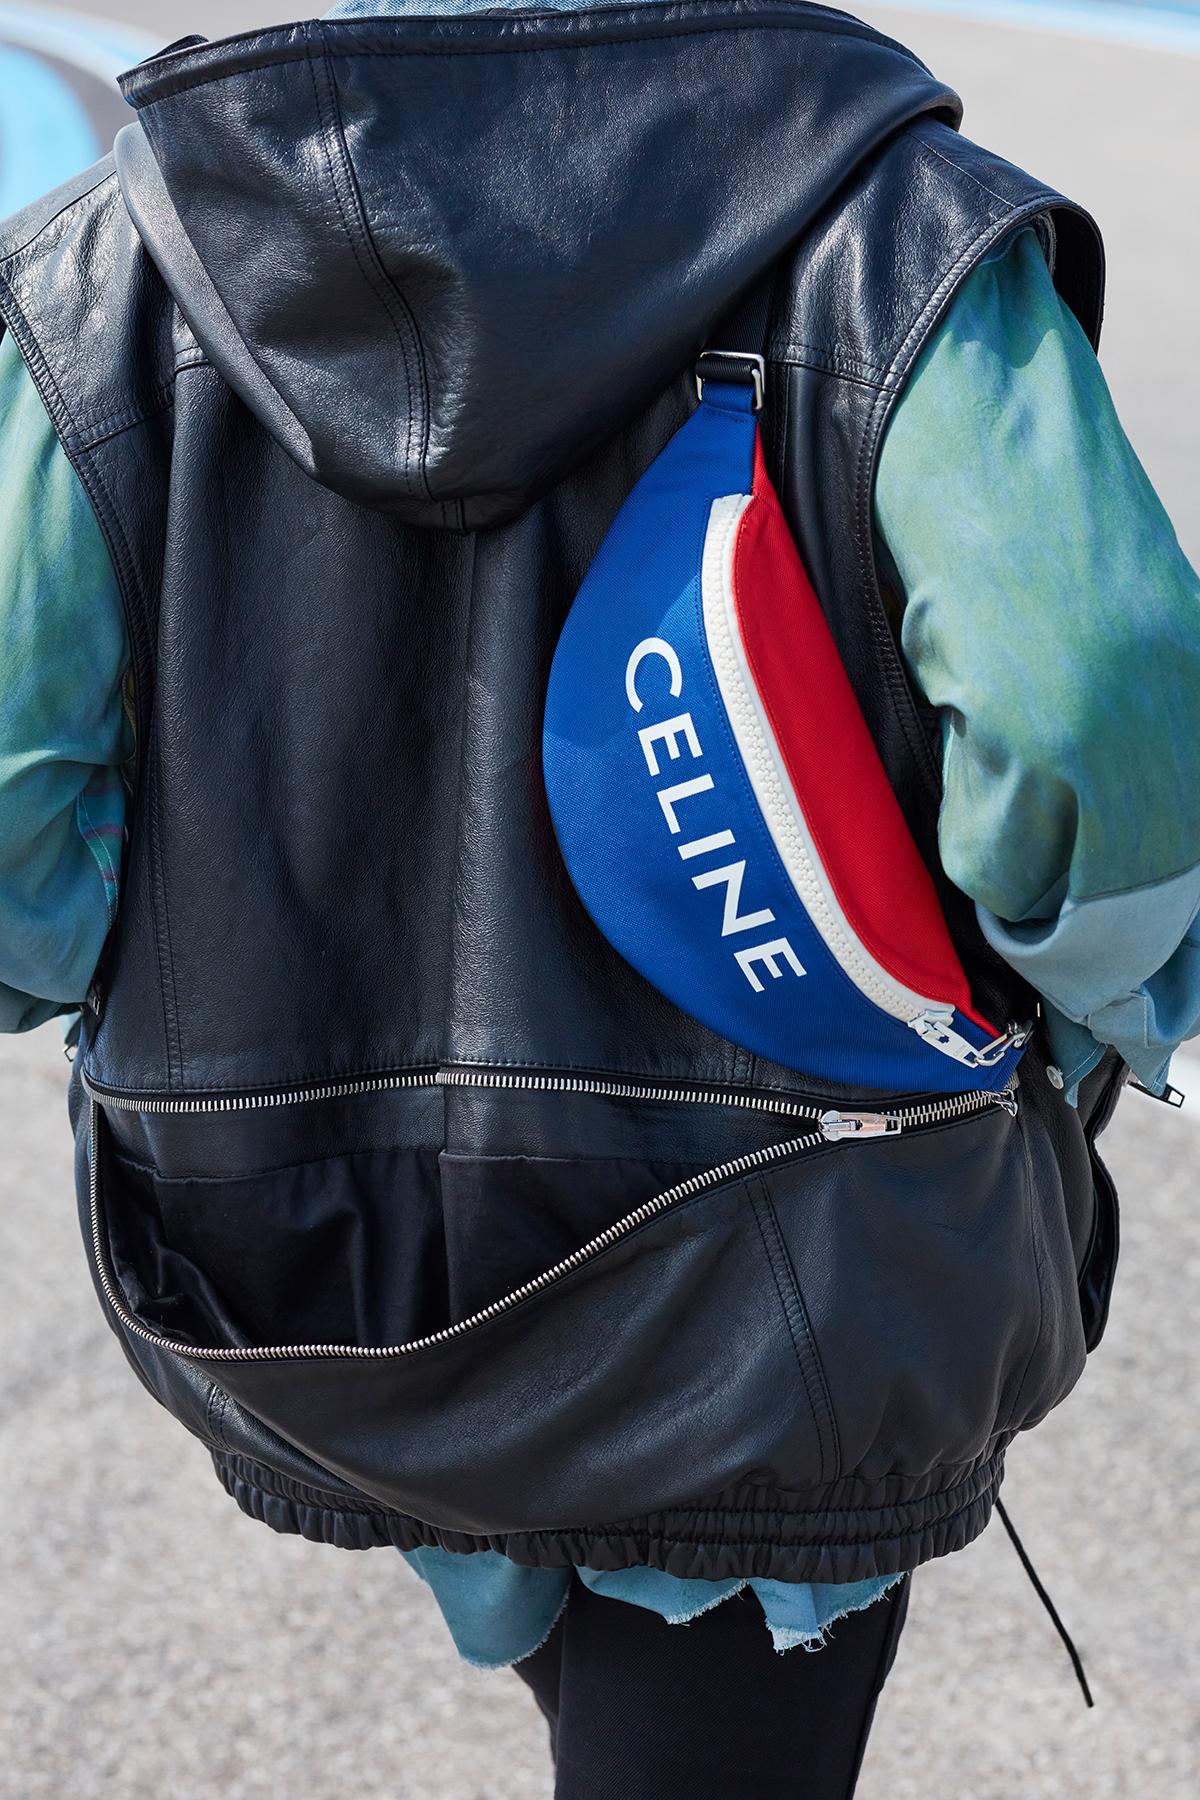 Celine Spring 2021 Men's Fashion Show Review